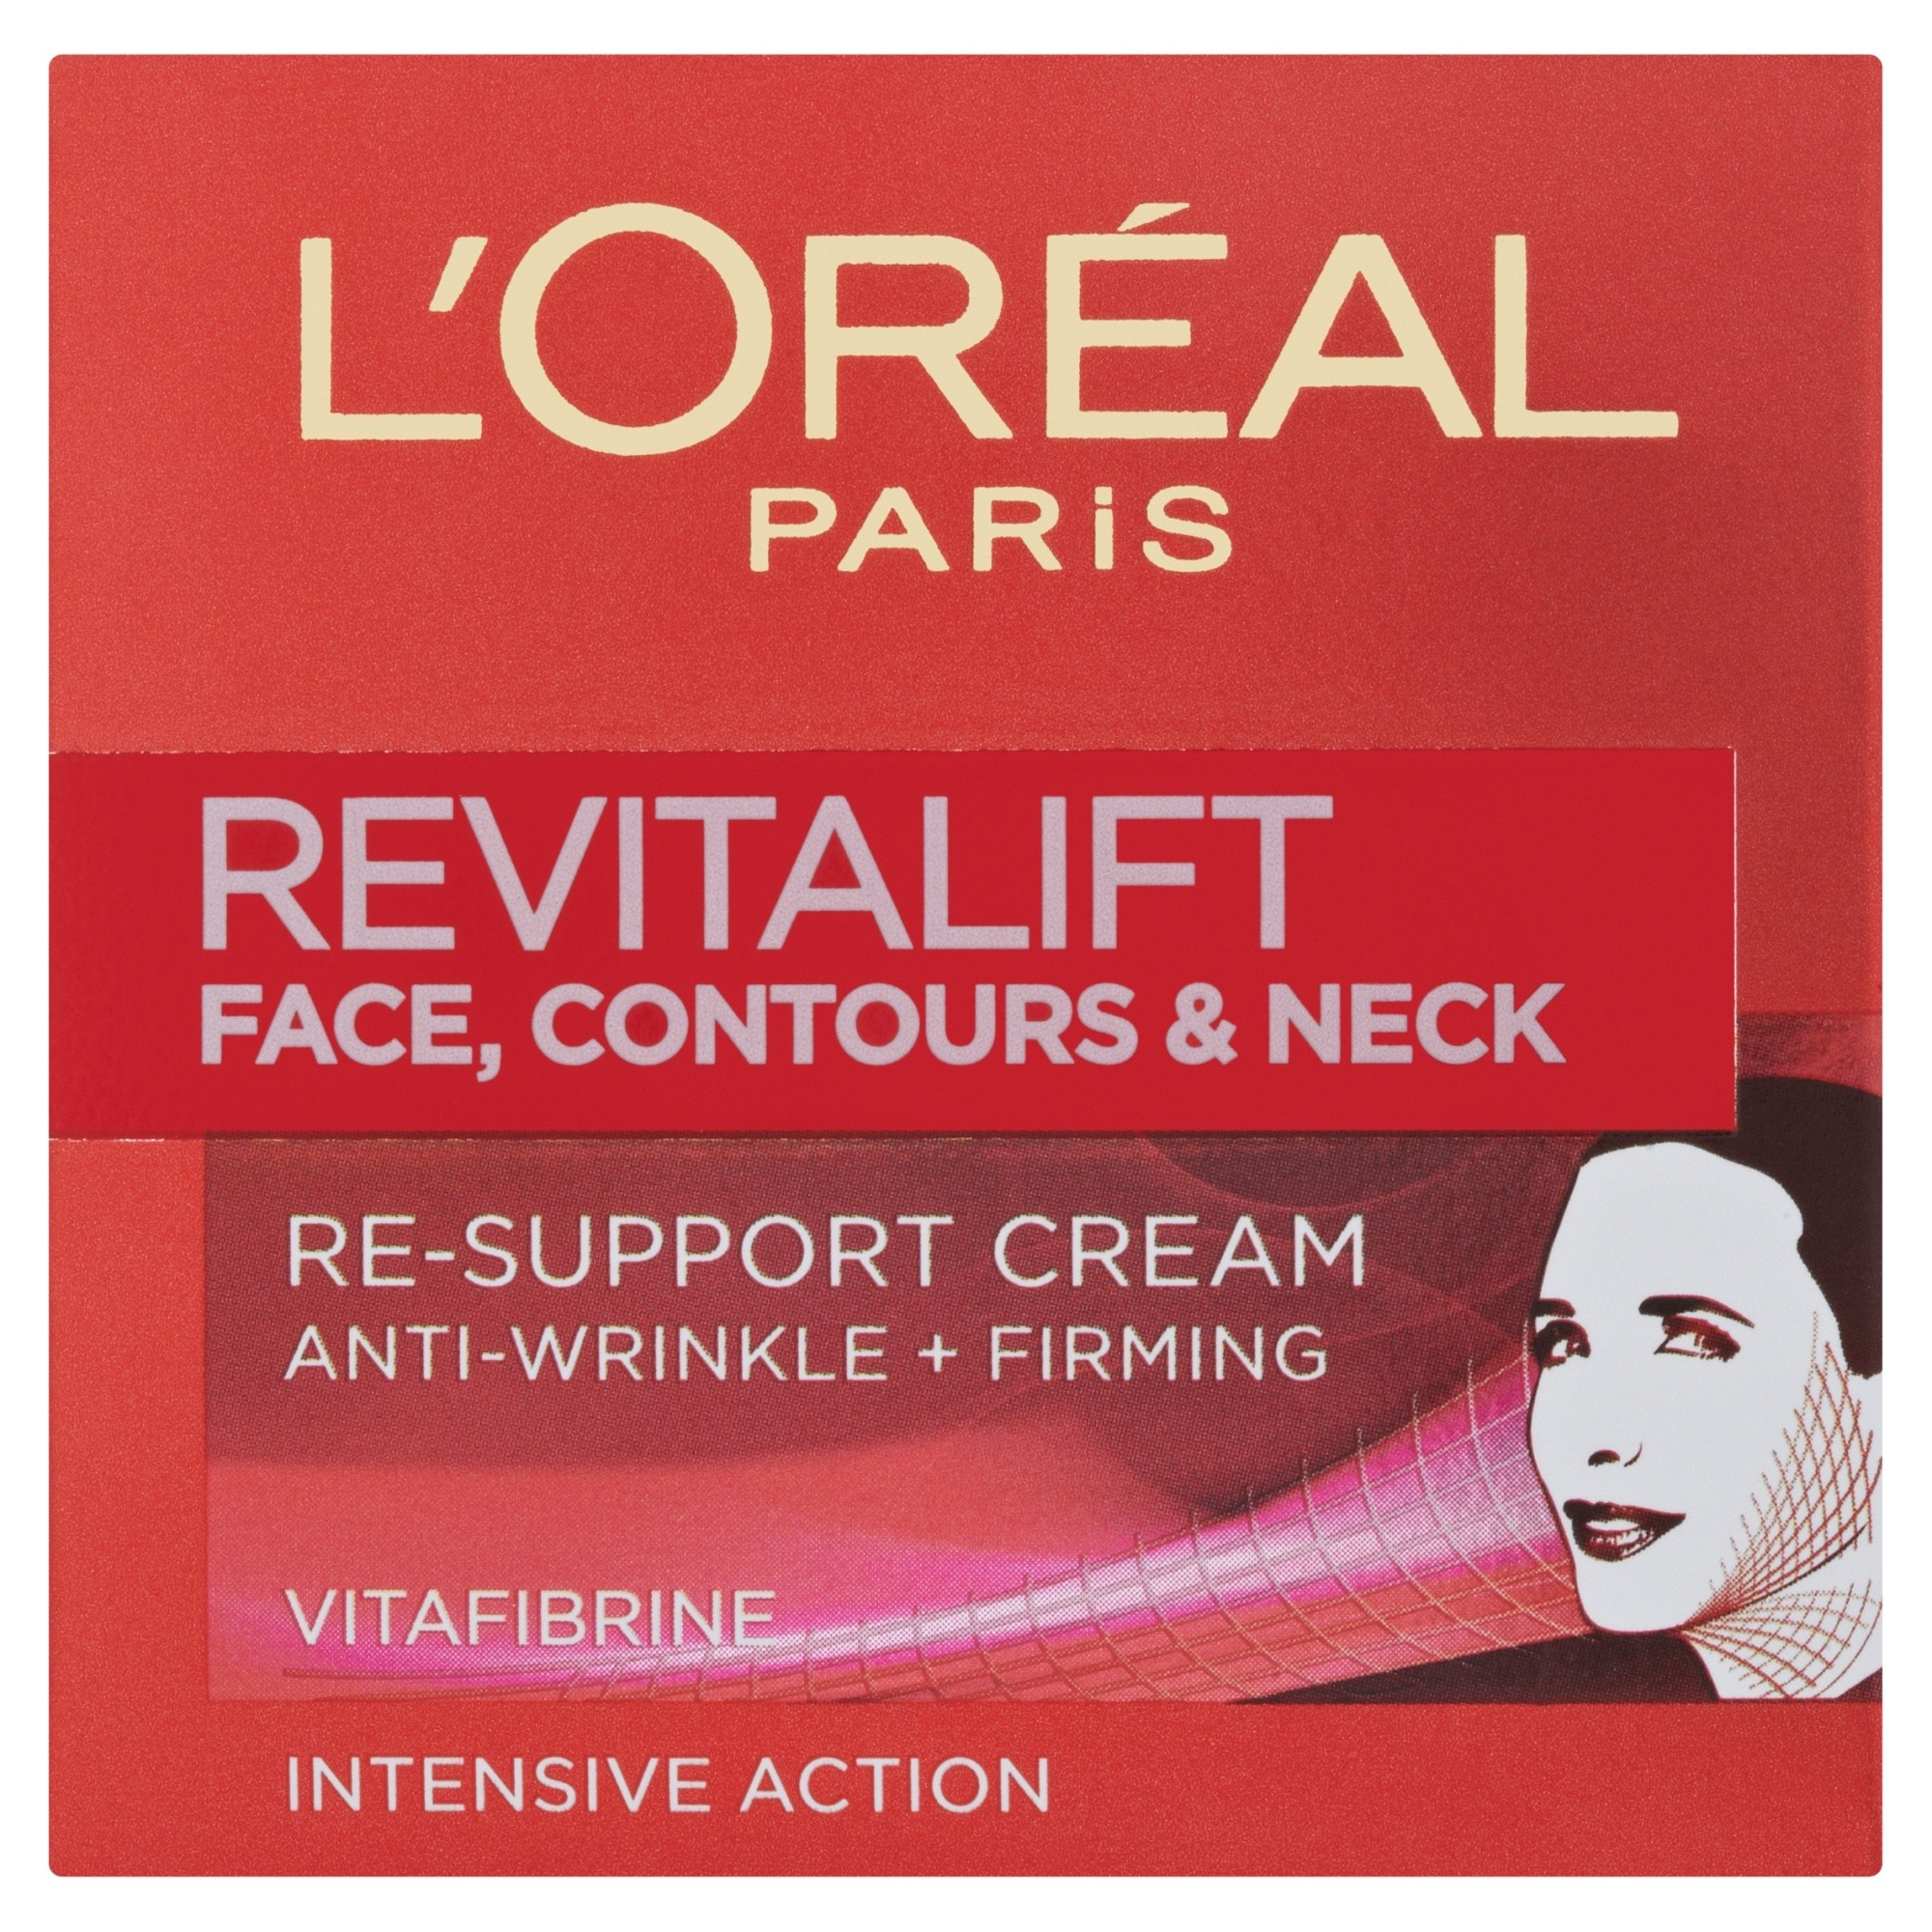 L'Oreal Paris Revitalift Face Contours and Neck Re-Support Cream